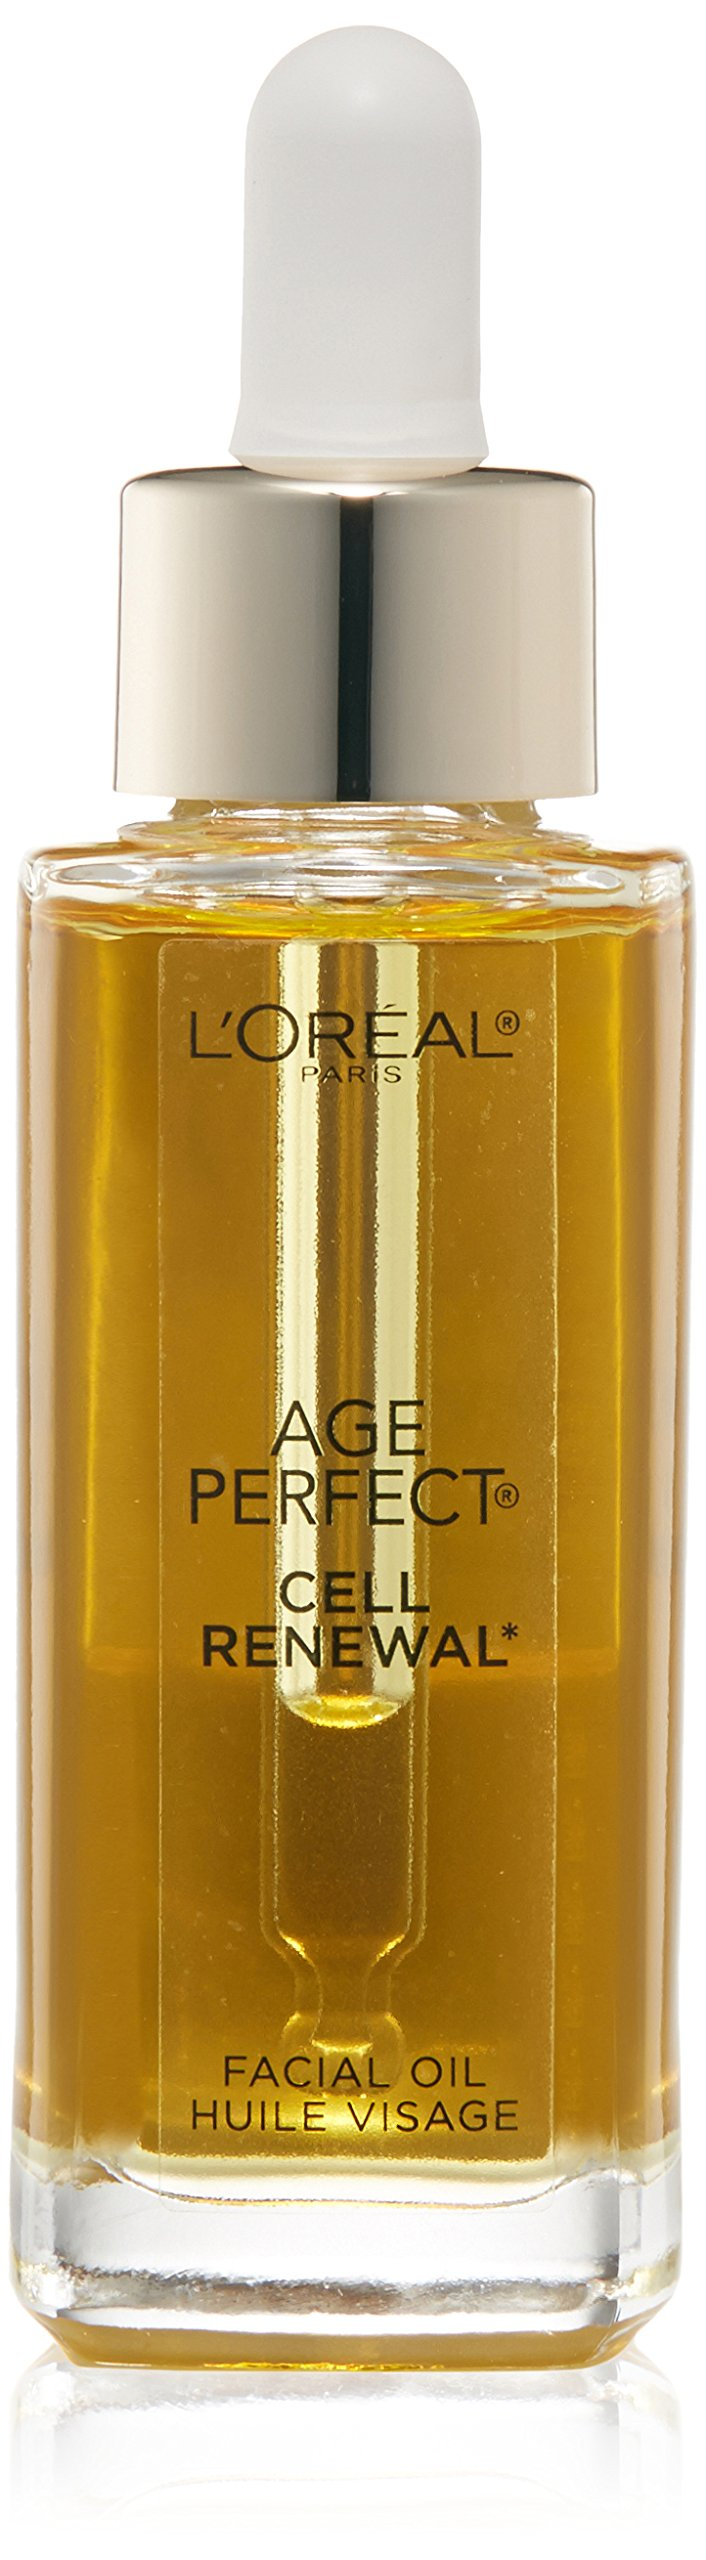 age perfect glow renewal facial oil